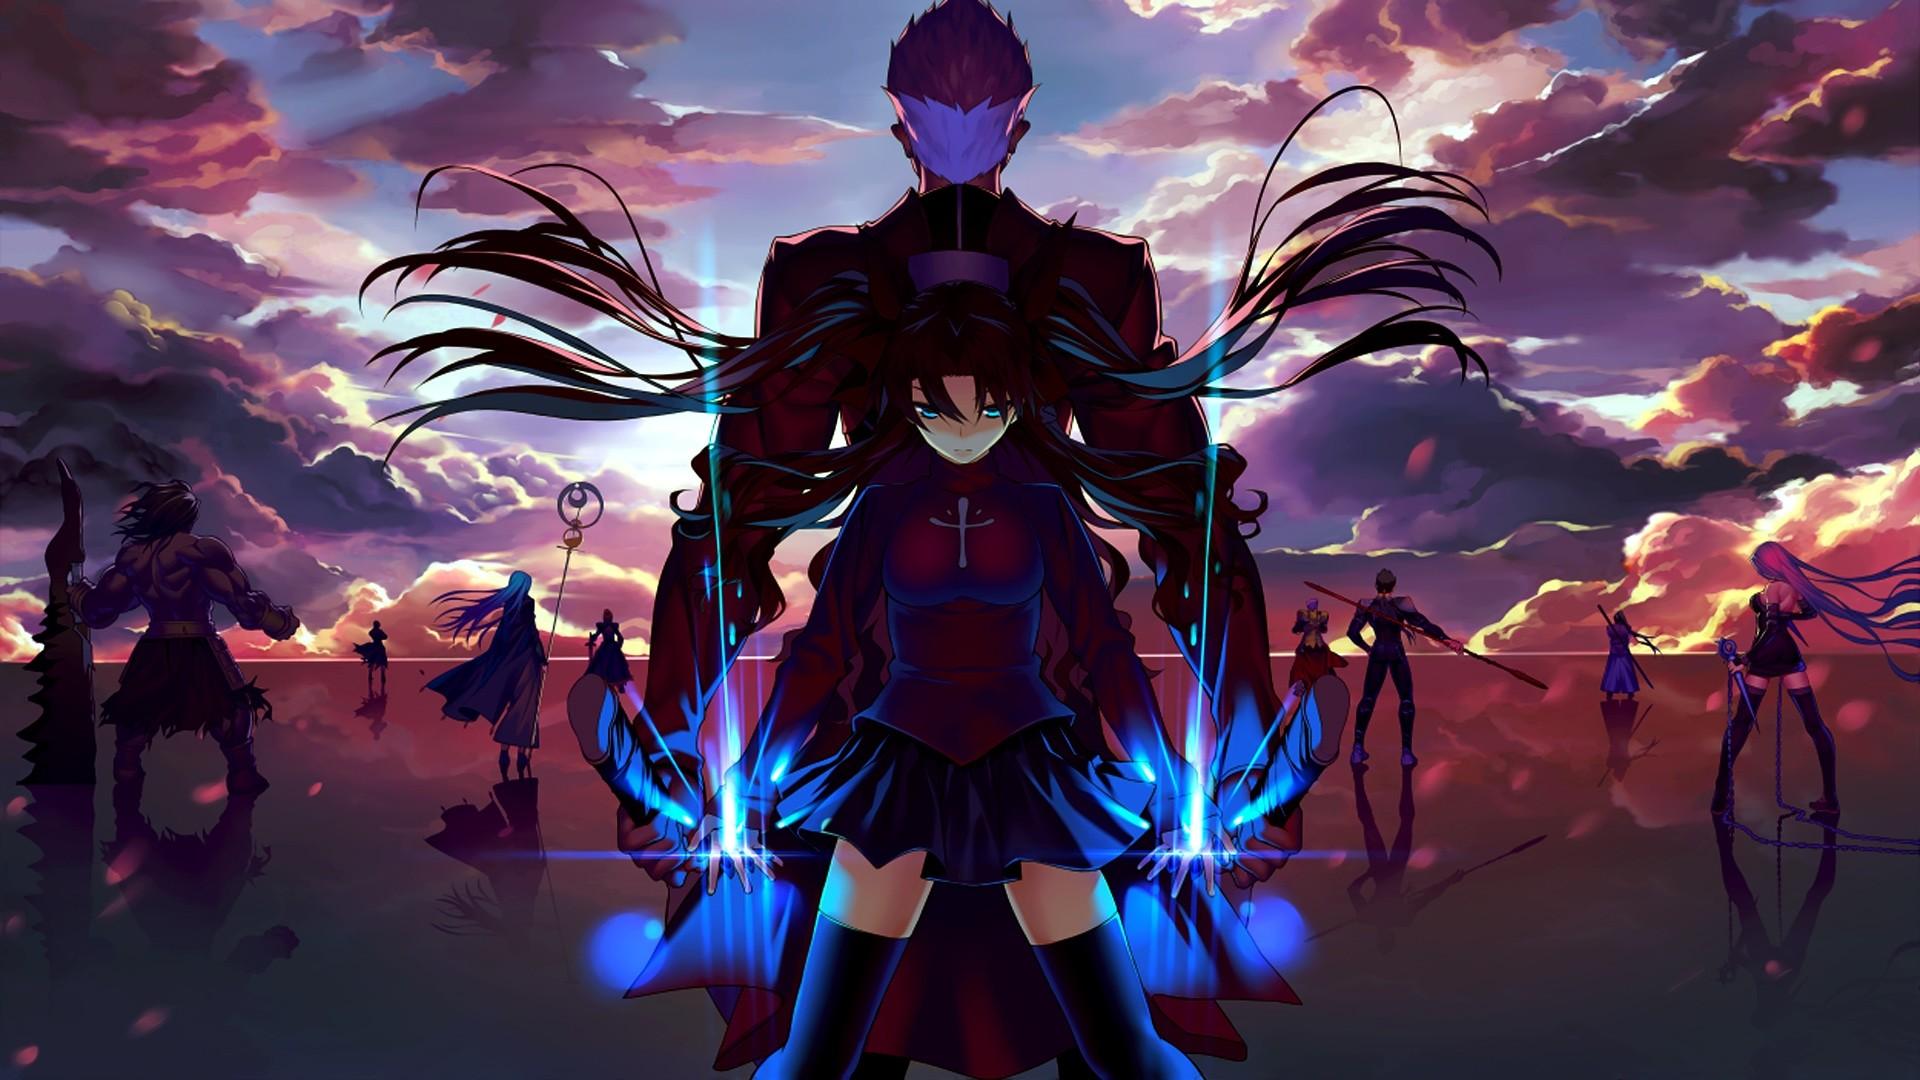 Fate Stay Night Lancer Wallpapers Anime Wallpaper Arunnath 1920 X 1080 Anime 1920x1080 Wallpaper Teahub Io